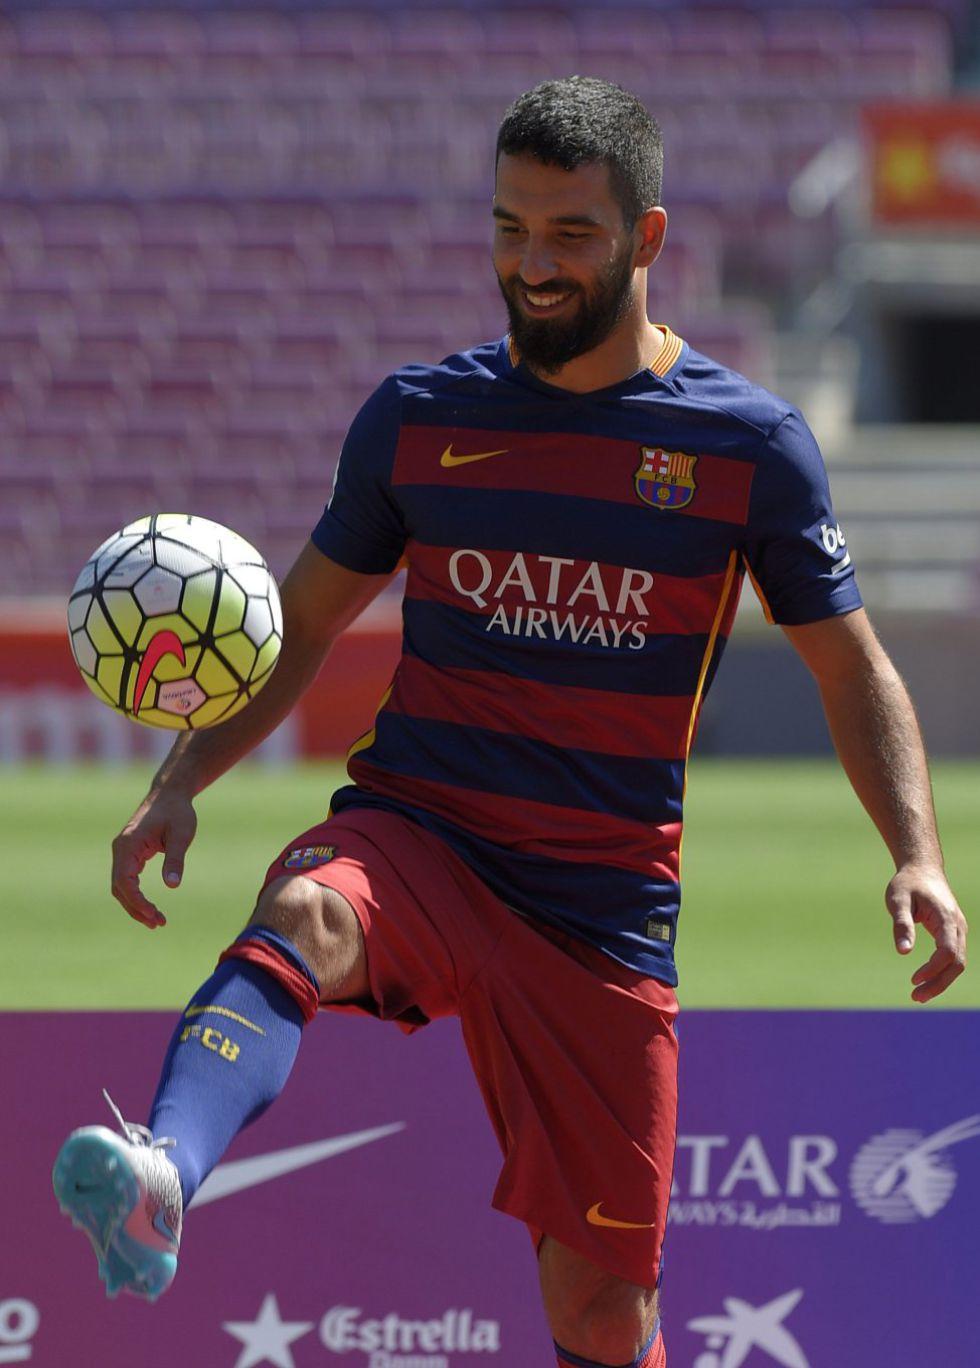 Barcelona Arda Turan heredará el número  7  que dejó huérfano Pedro ... 4bbfc2b2e8f68